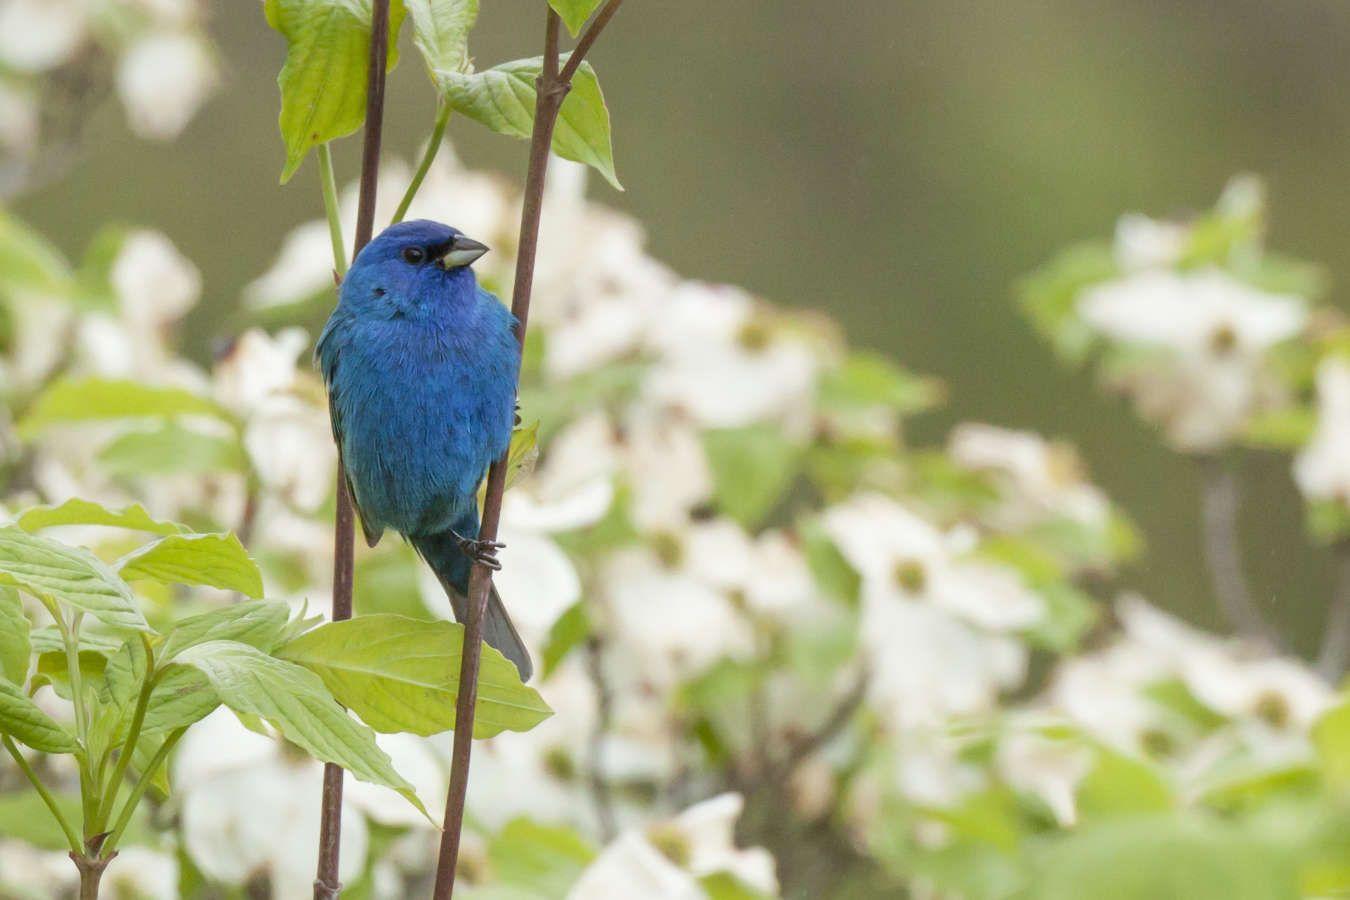 Outings To Satisfy Your Inner Bird Nerd Asheville Nc S Official Travel Site Bird Watching Wild Birds Unlimited Bird Species